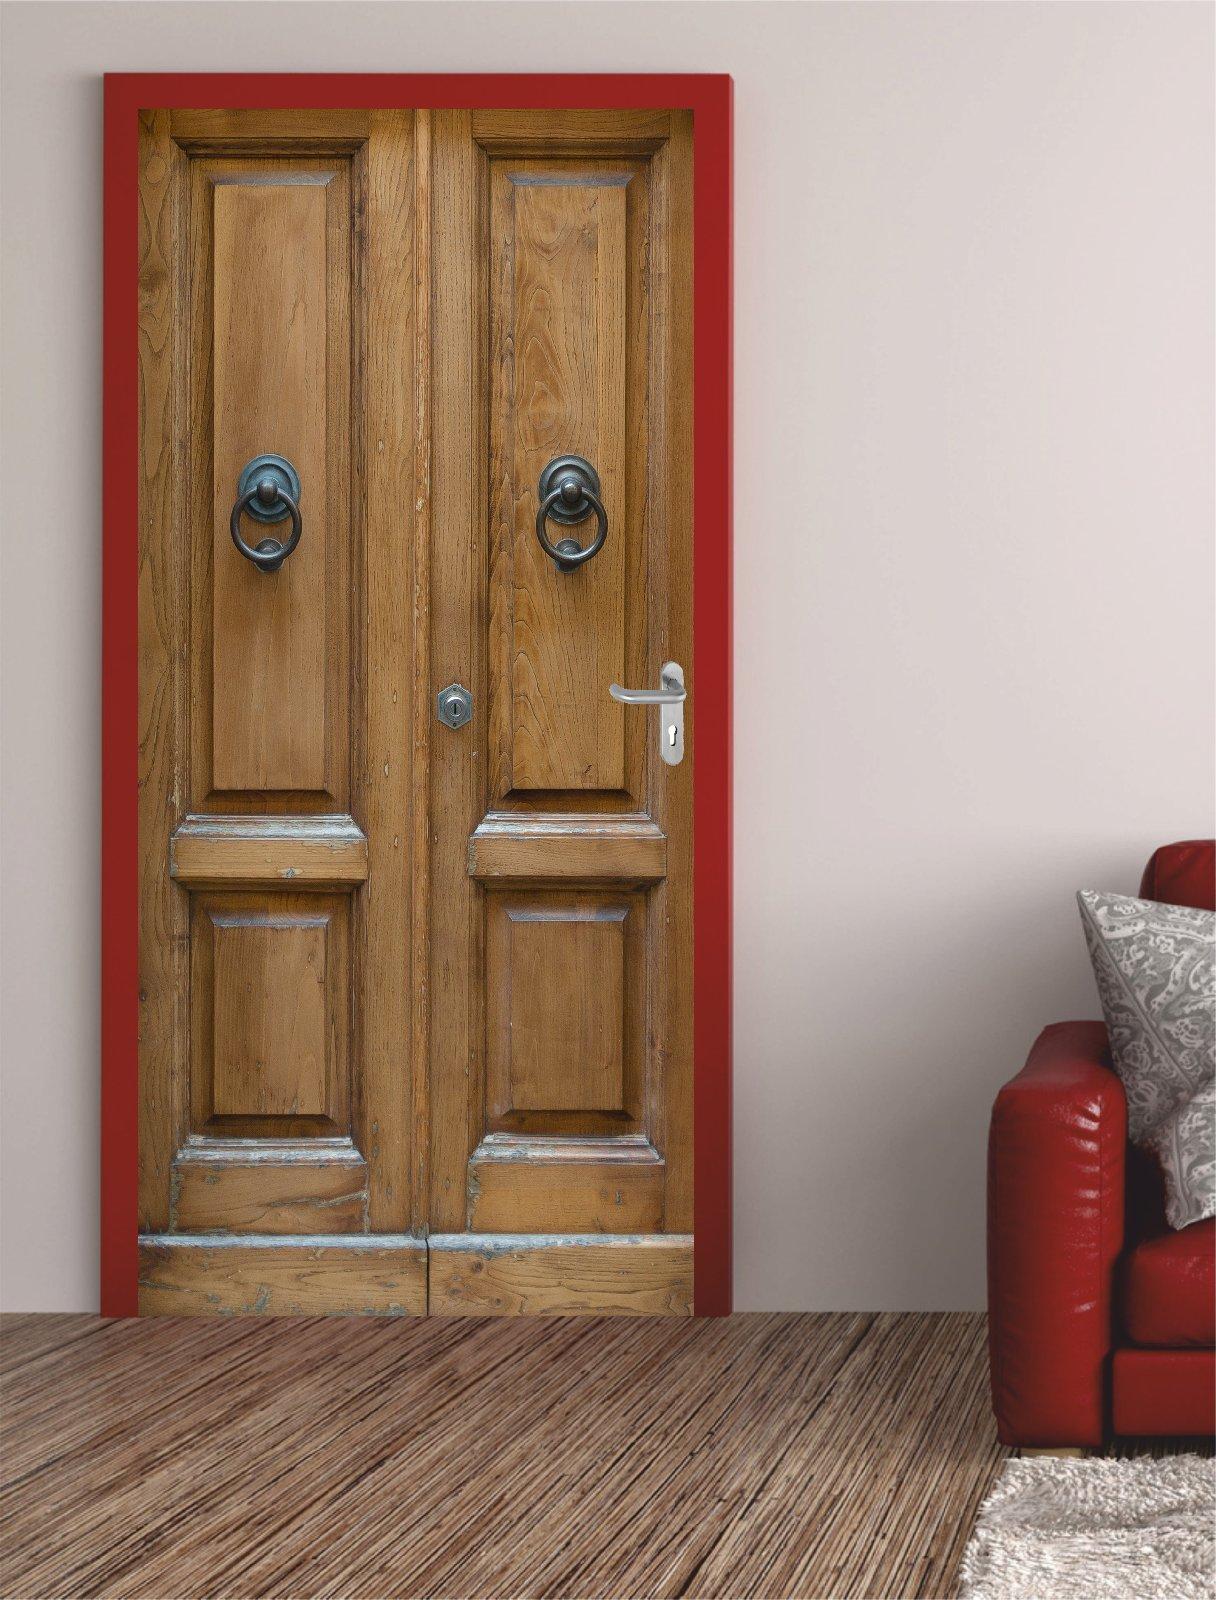 digitaldruck t rposter alte haust r t raufkleber t rfolie t rtapete. Black Bedroom Furniture Sets. Home Design Ideas